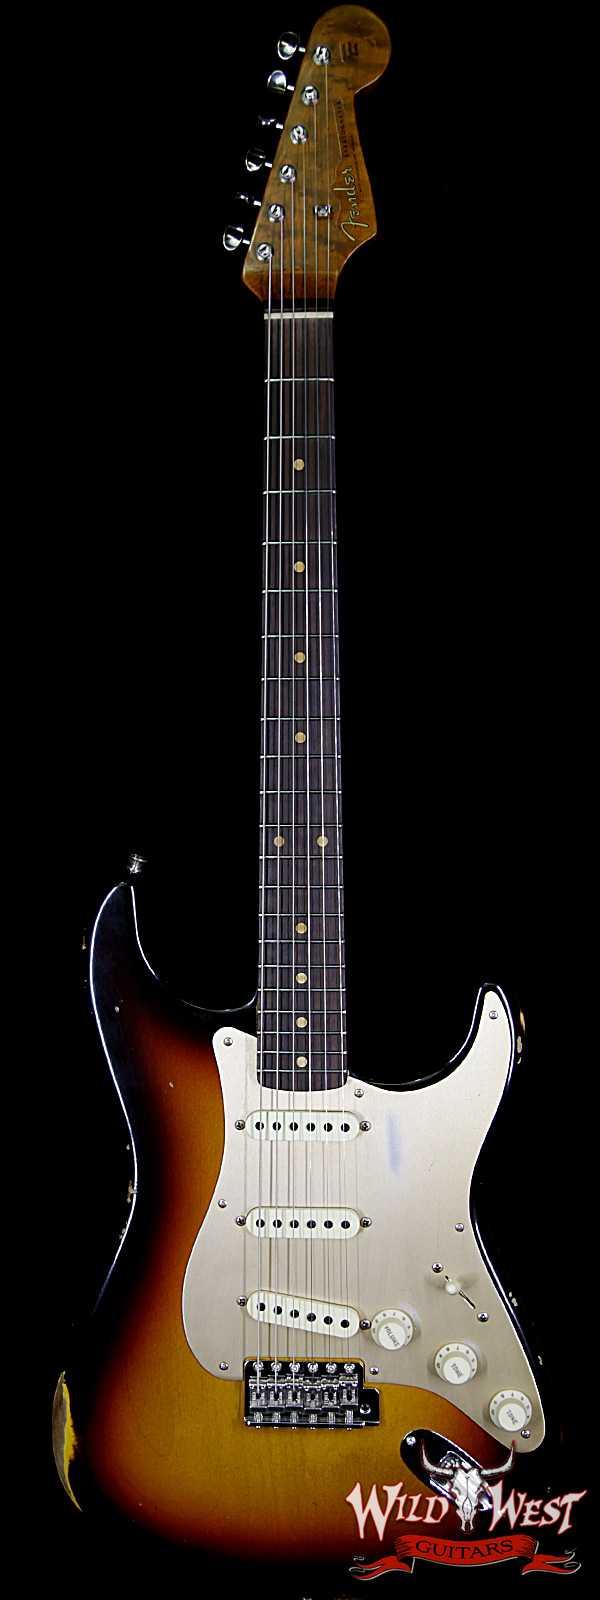 Fender Custom Shop 1960 Stratocaster Relic  Roasted Birdseye Neck Rosewood Fingerboard Faded 3 Tone Sunburst